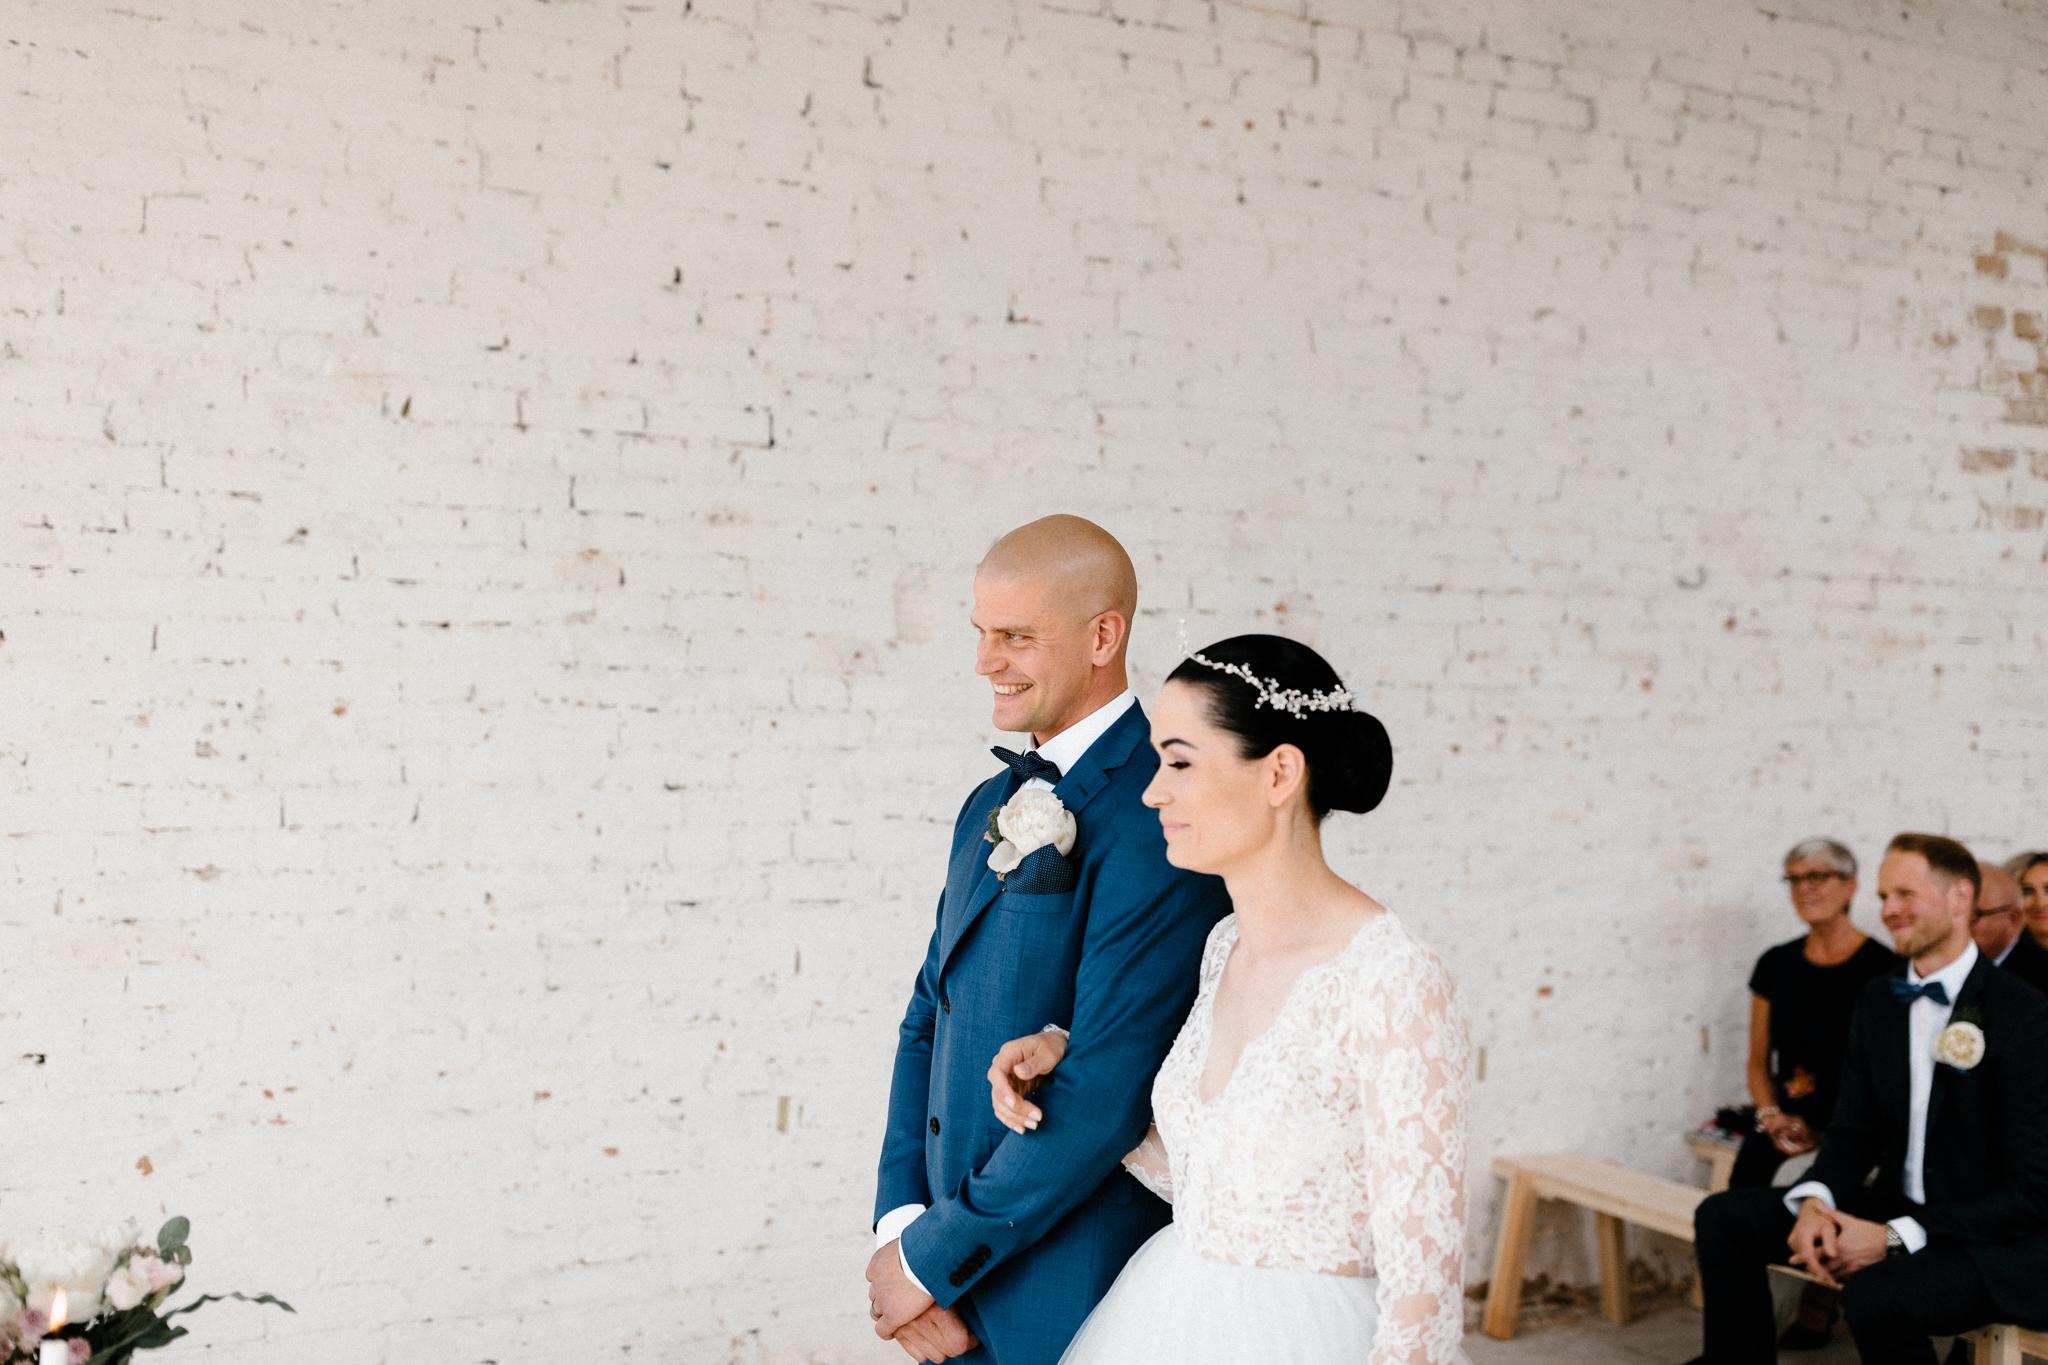 Essi + Ville   Oitbacka Gården   by Patrick Karkkolainen Wedding Photography-154.jpg